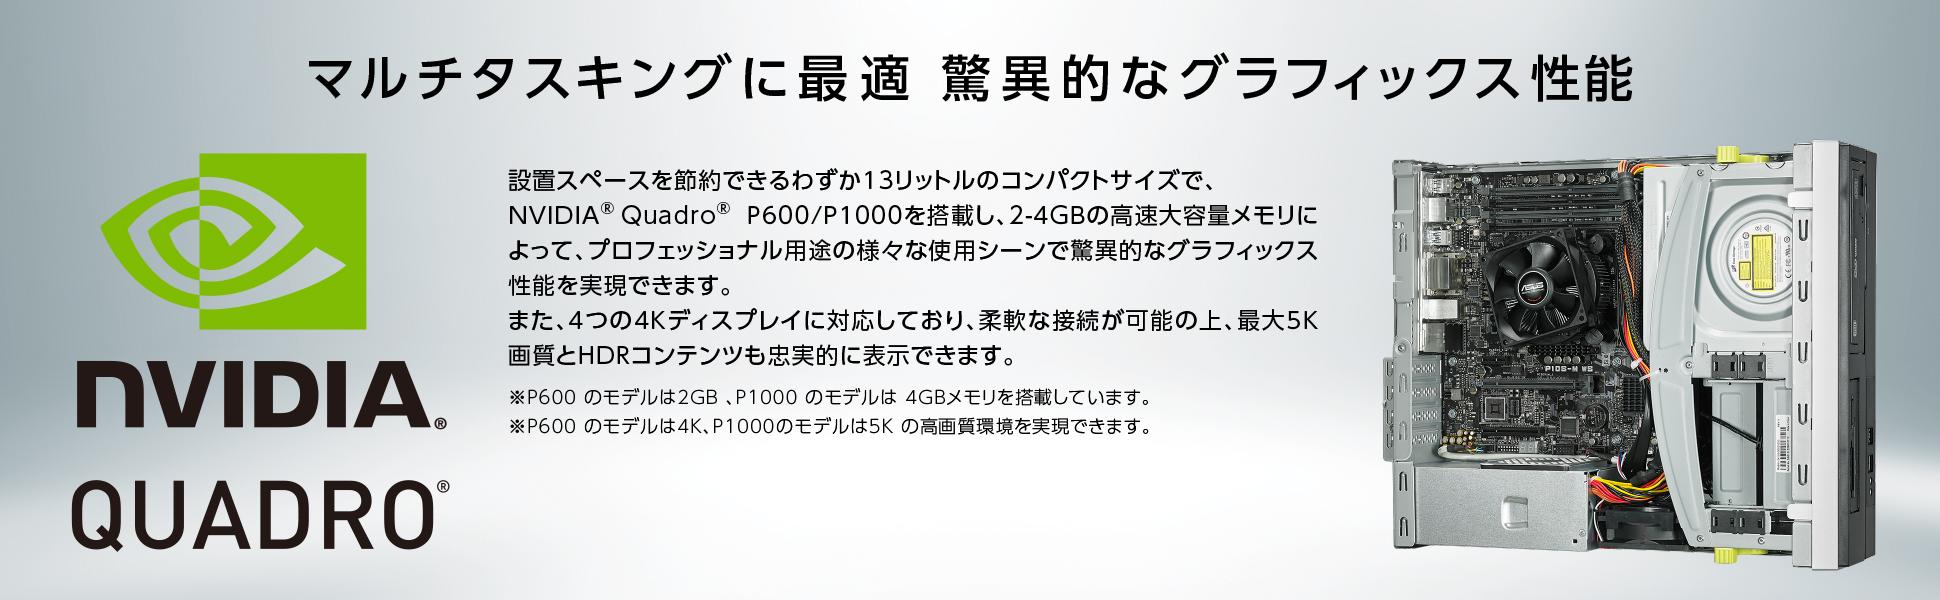 ESC500-G4-SFF